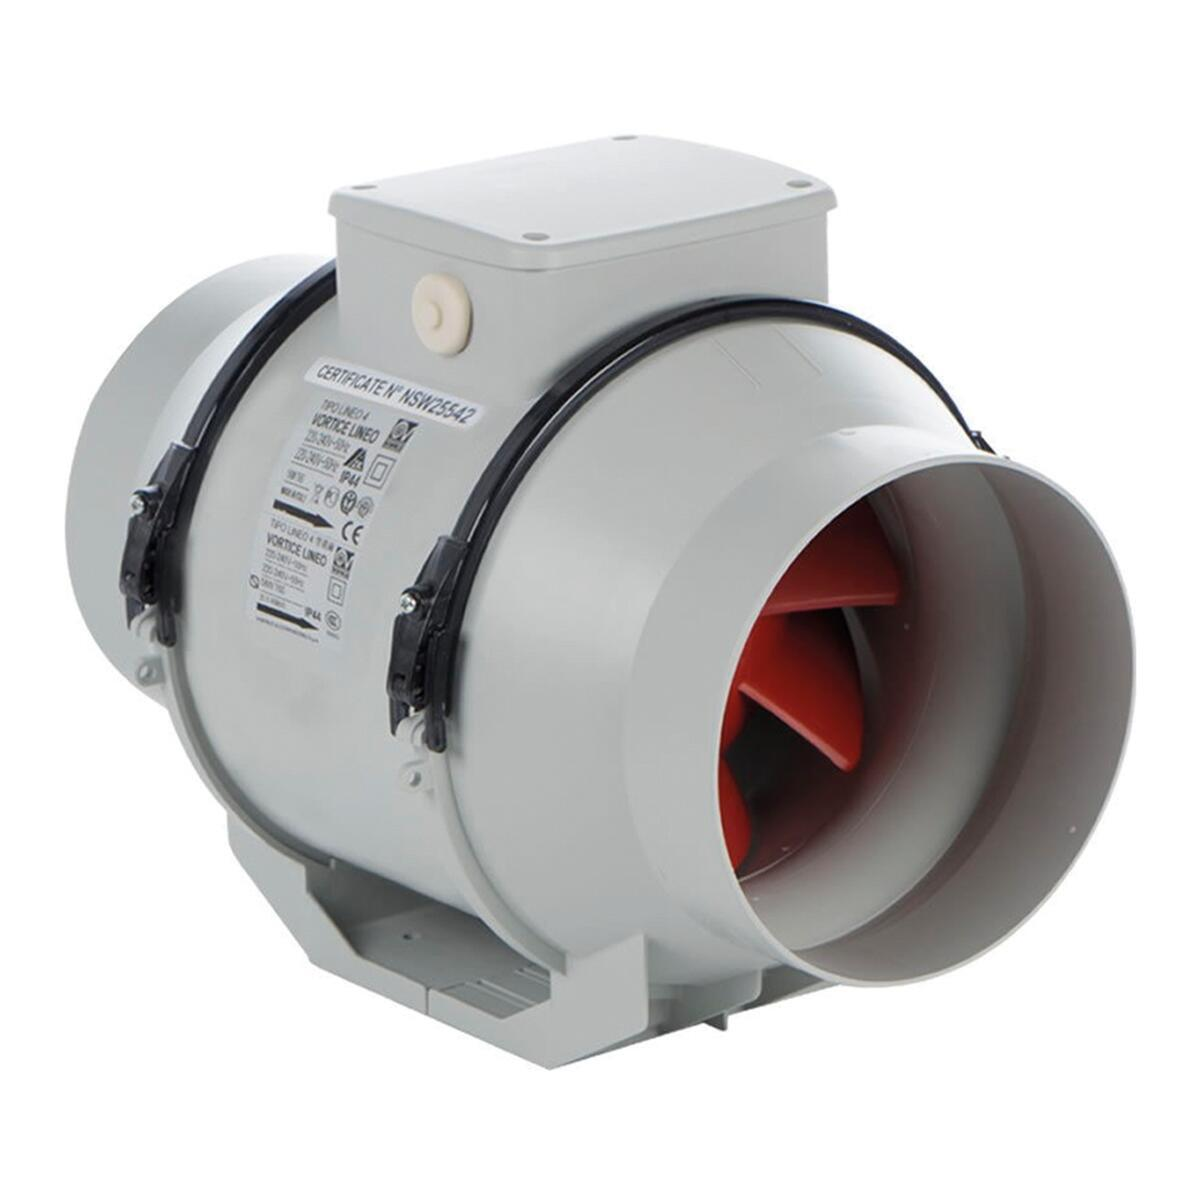 Aspiratore VORTICE LINEO 100 V0/1 Ø 100 mm - 1